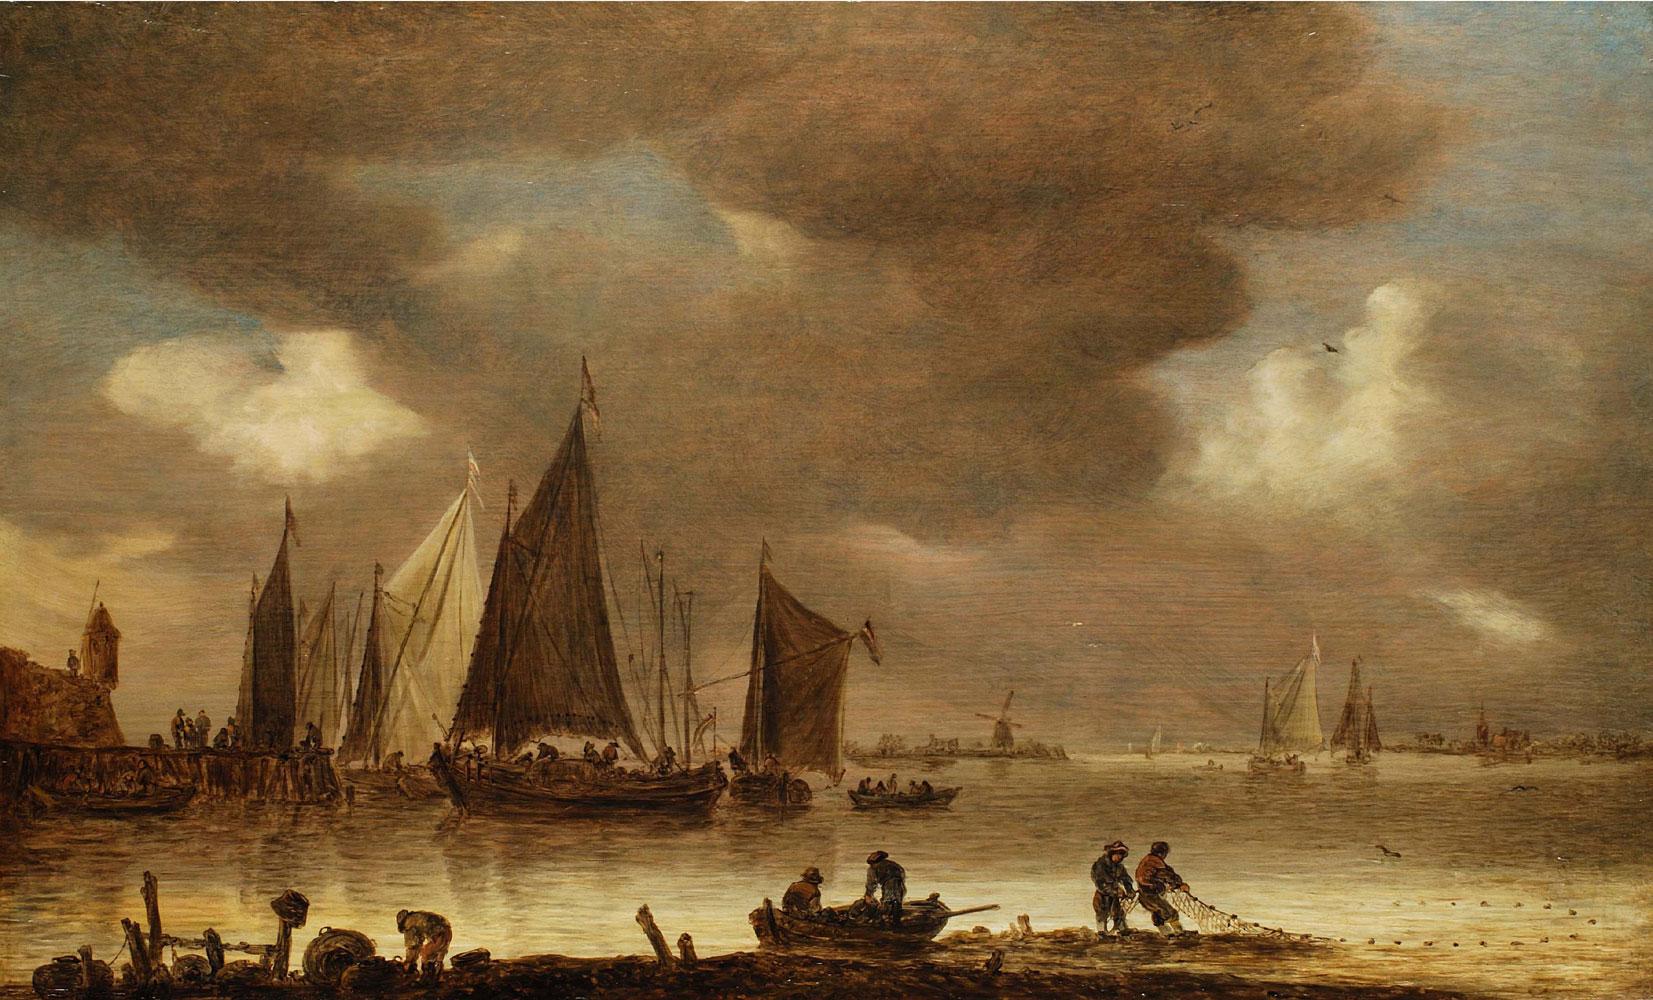 Jan van Goyen 1596 Leiden - 1656 Den Haag